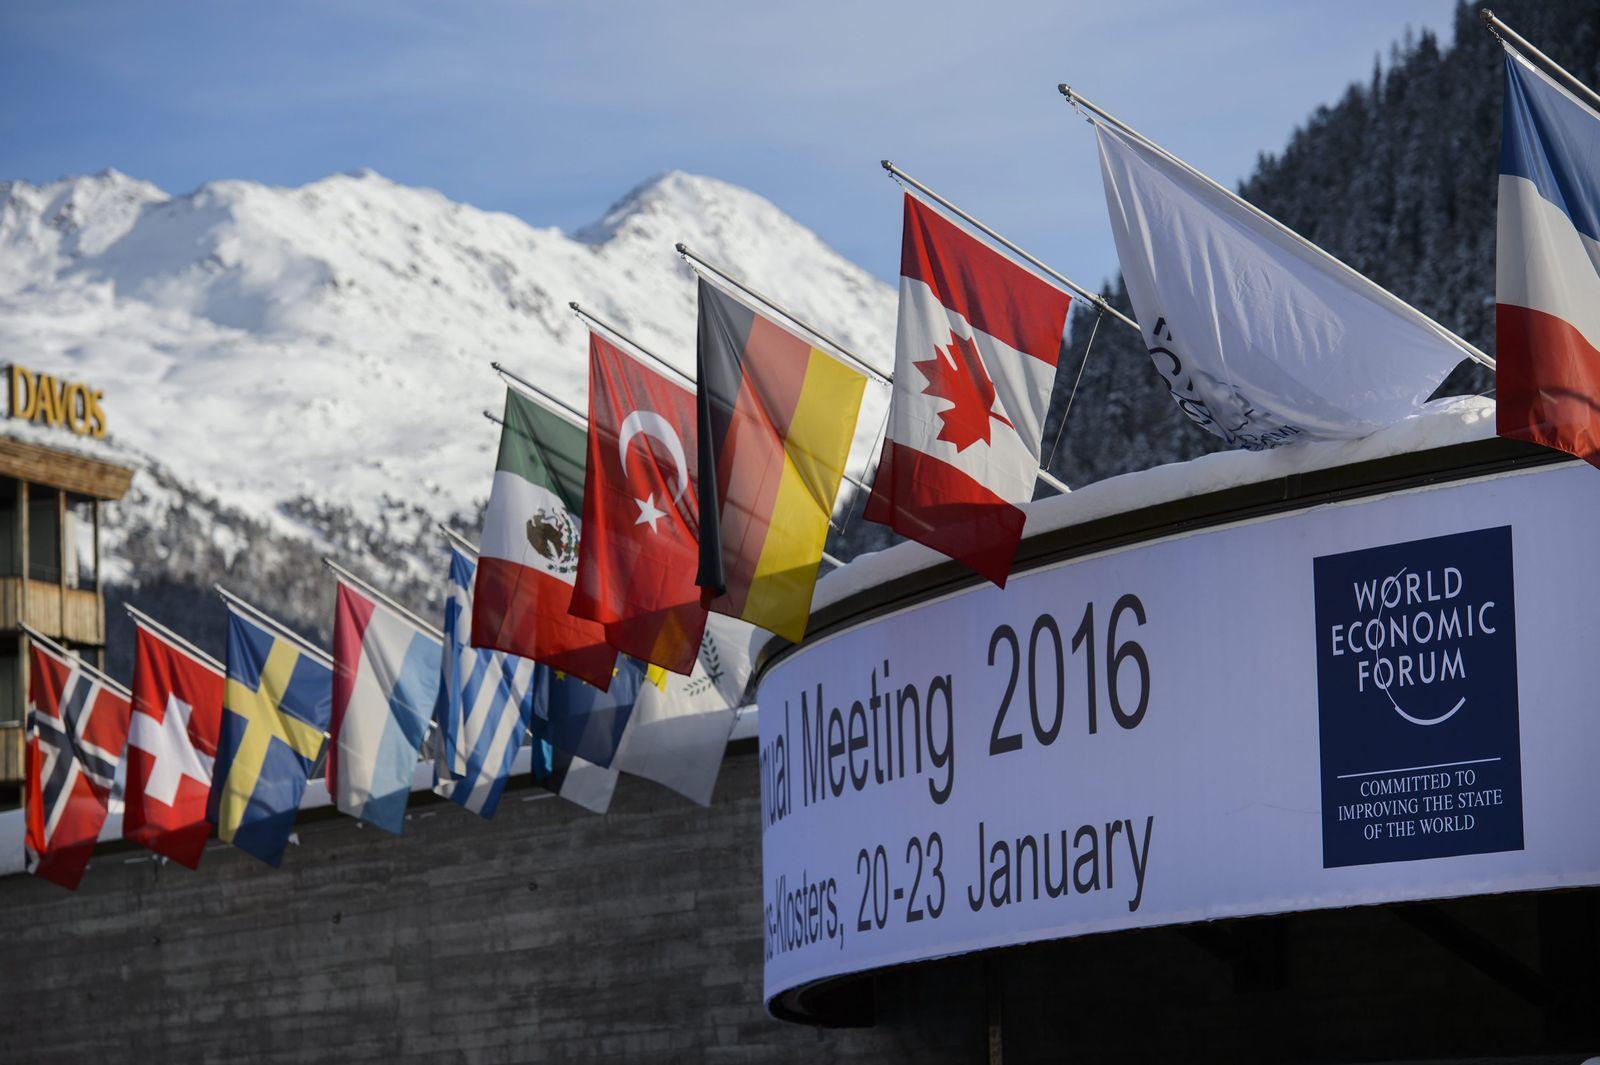 World Economic Forum, WEF Davos